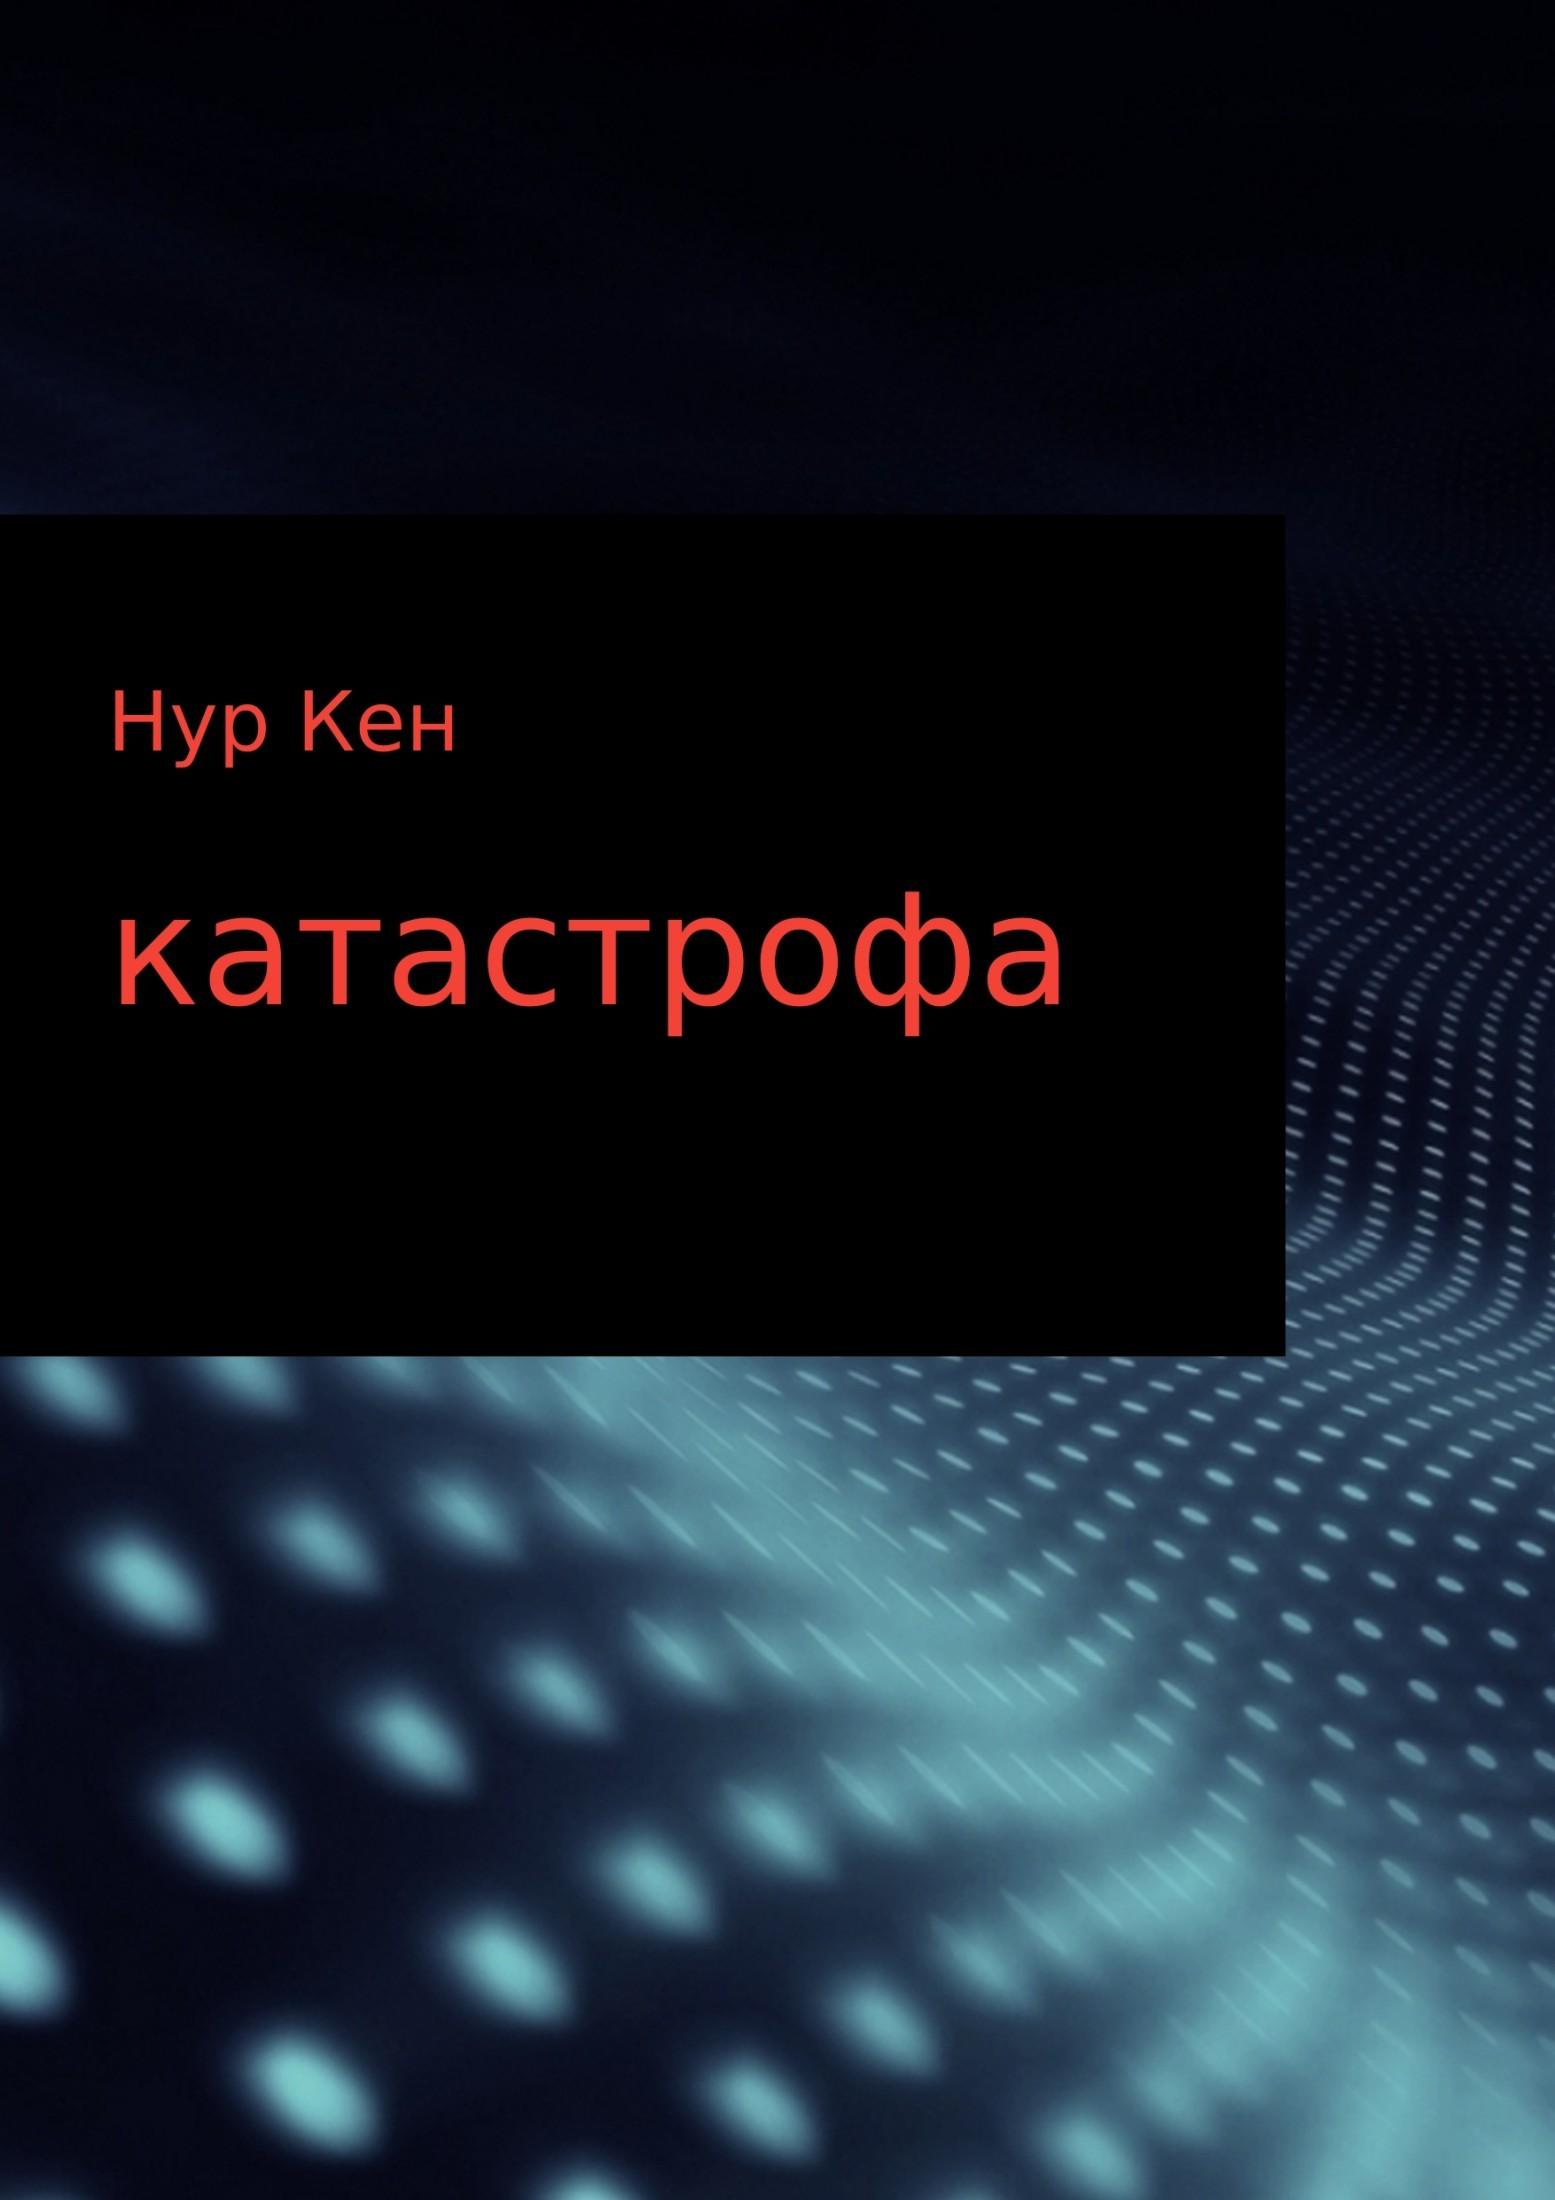 Нур Кен Катастрофа компьютер